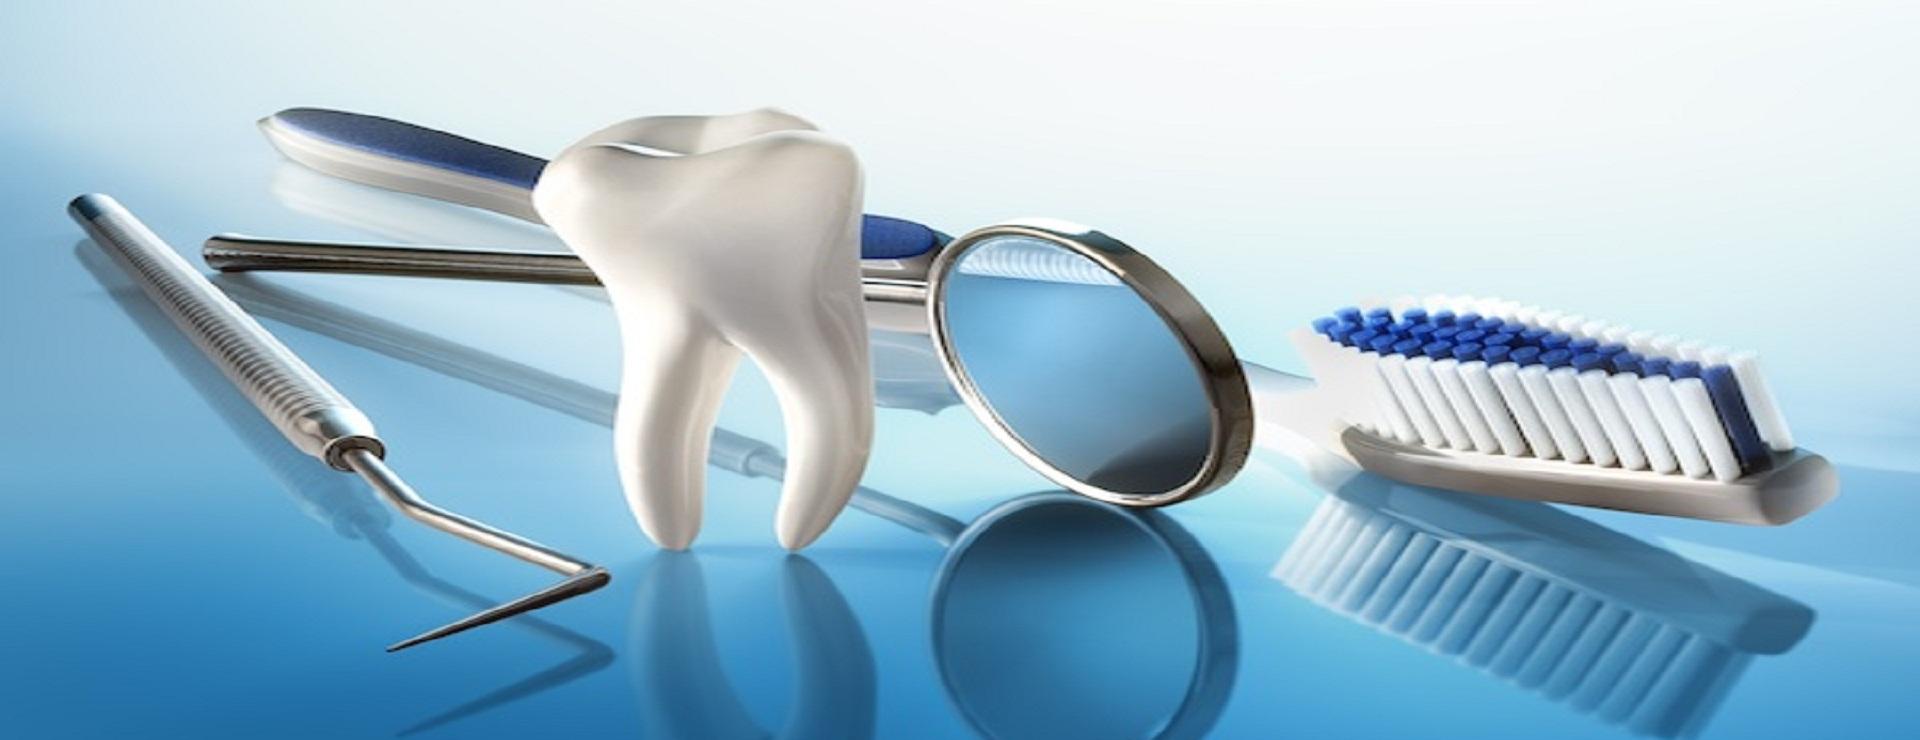 Dental solution cover